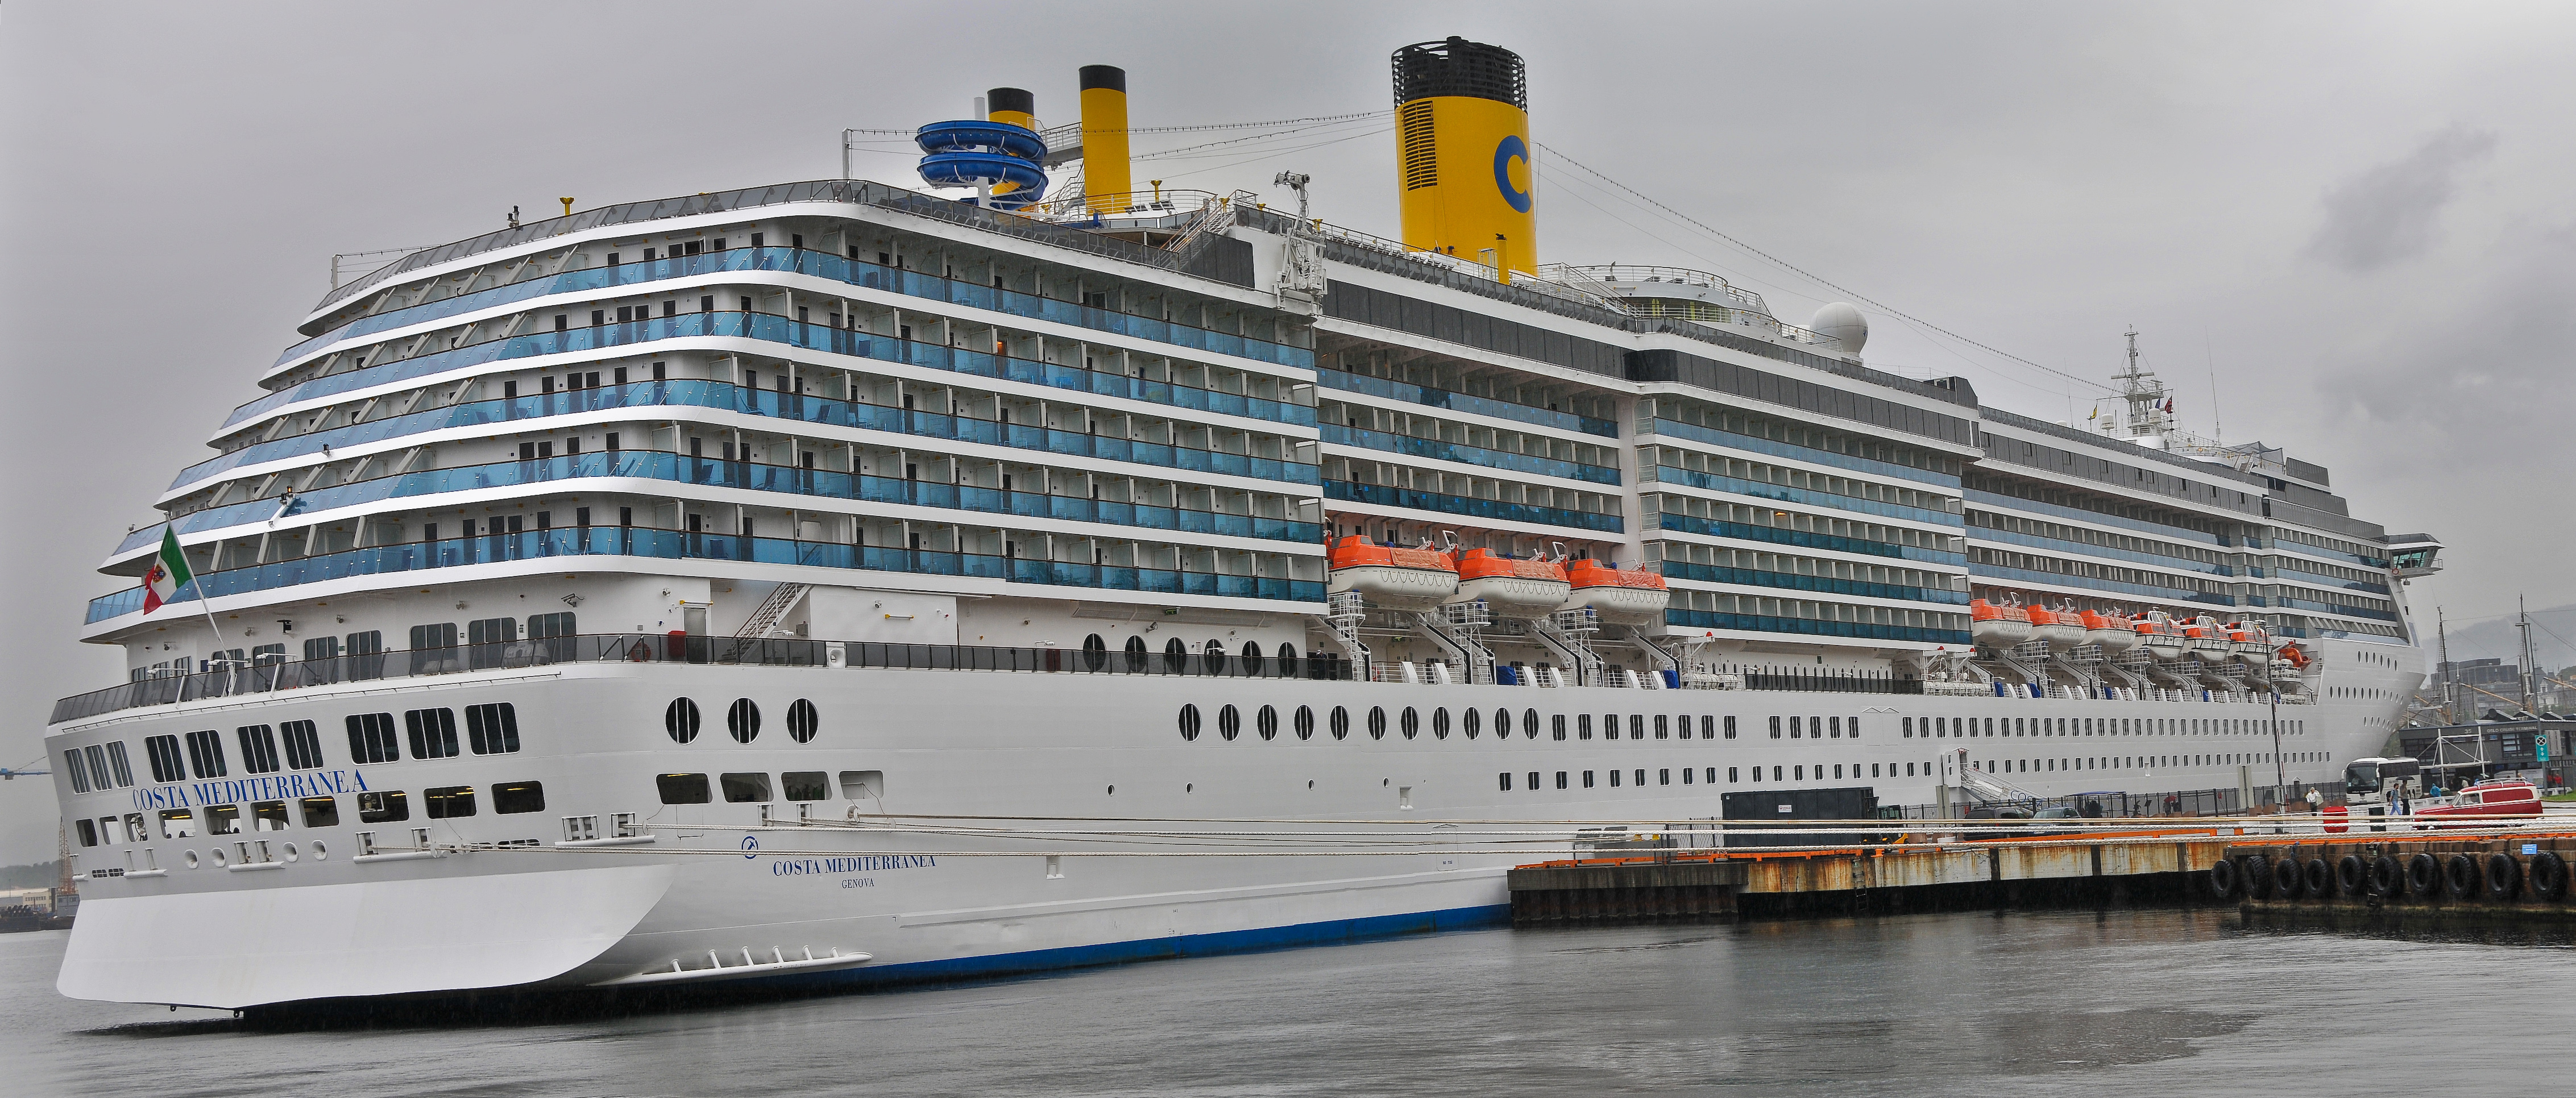 http://upload.wikimedia.org/wikipedia/commons/5/52/Costa_mediterranea.jpg